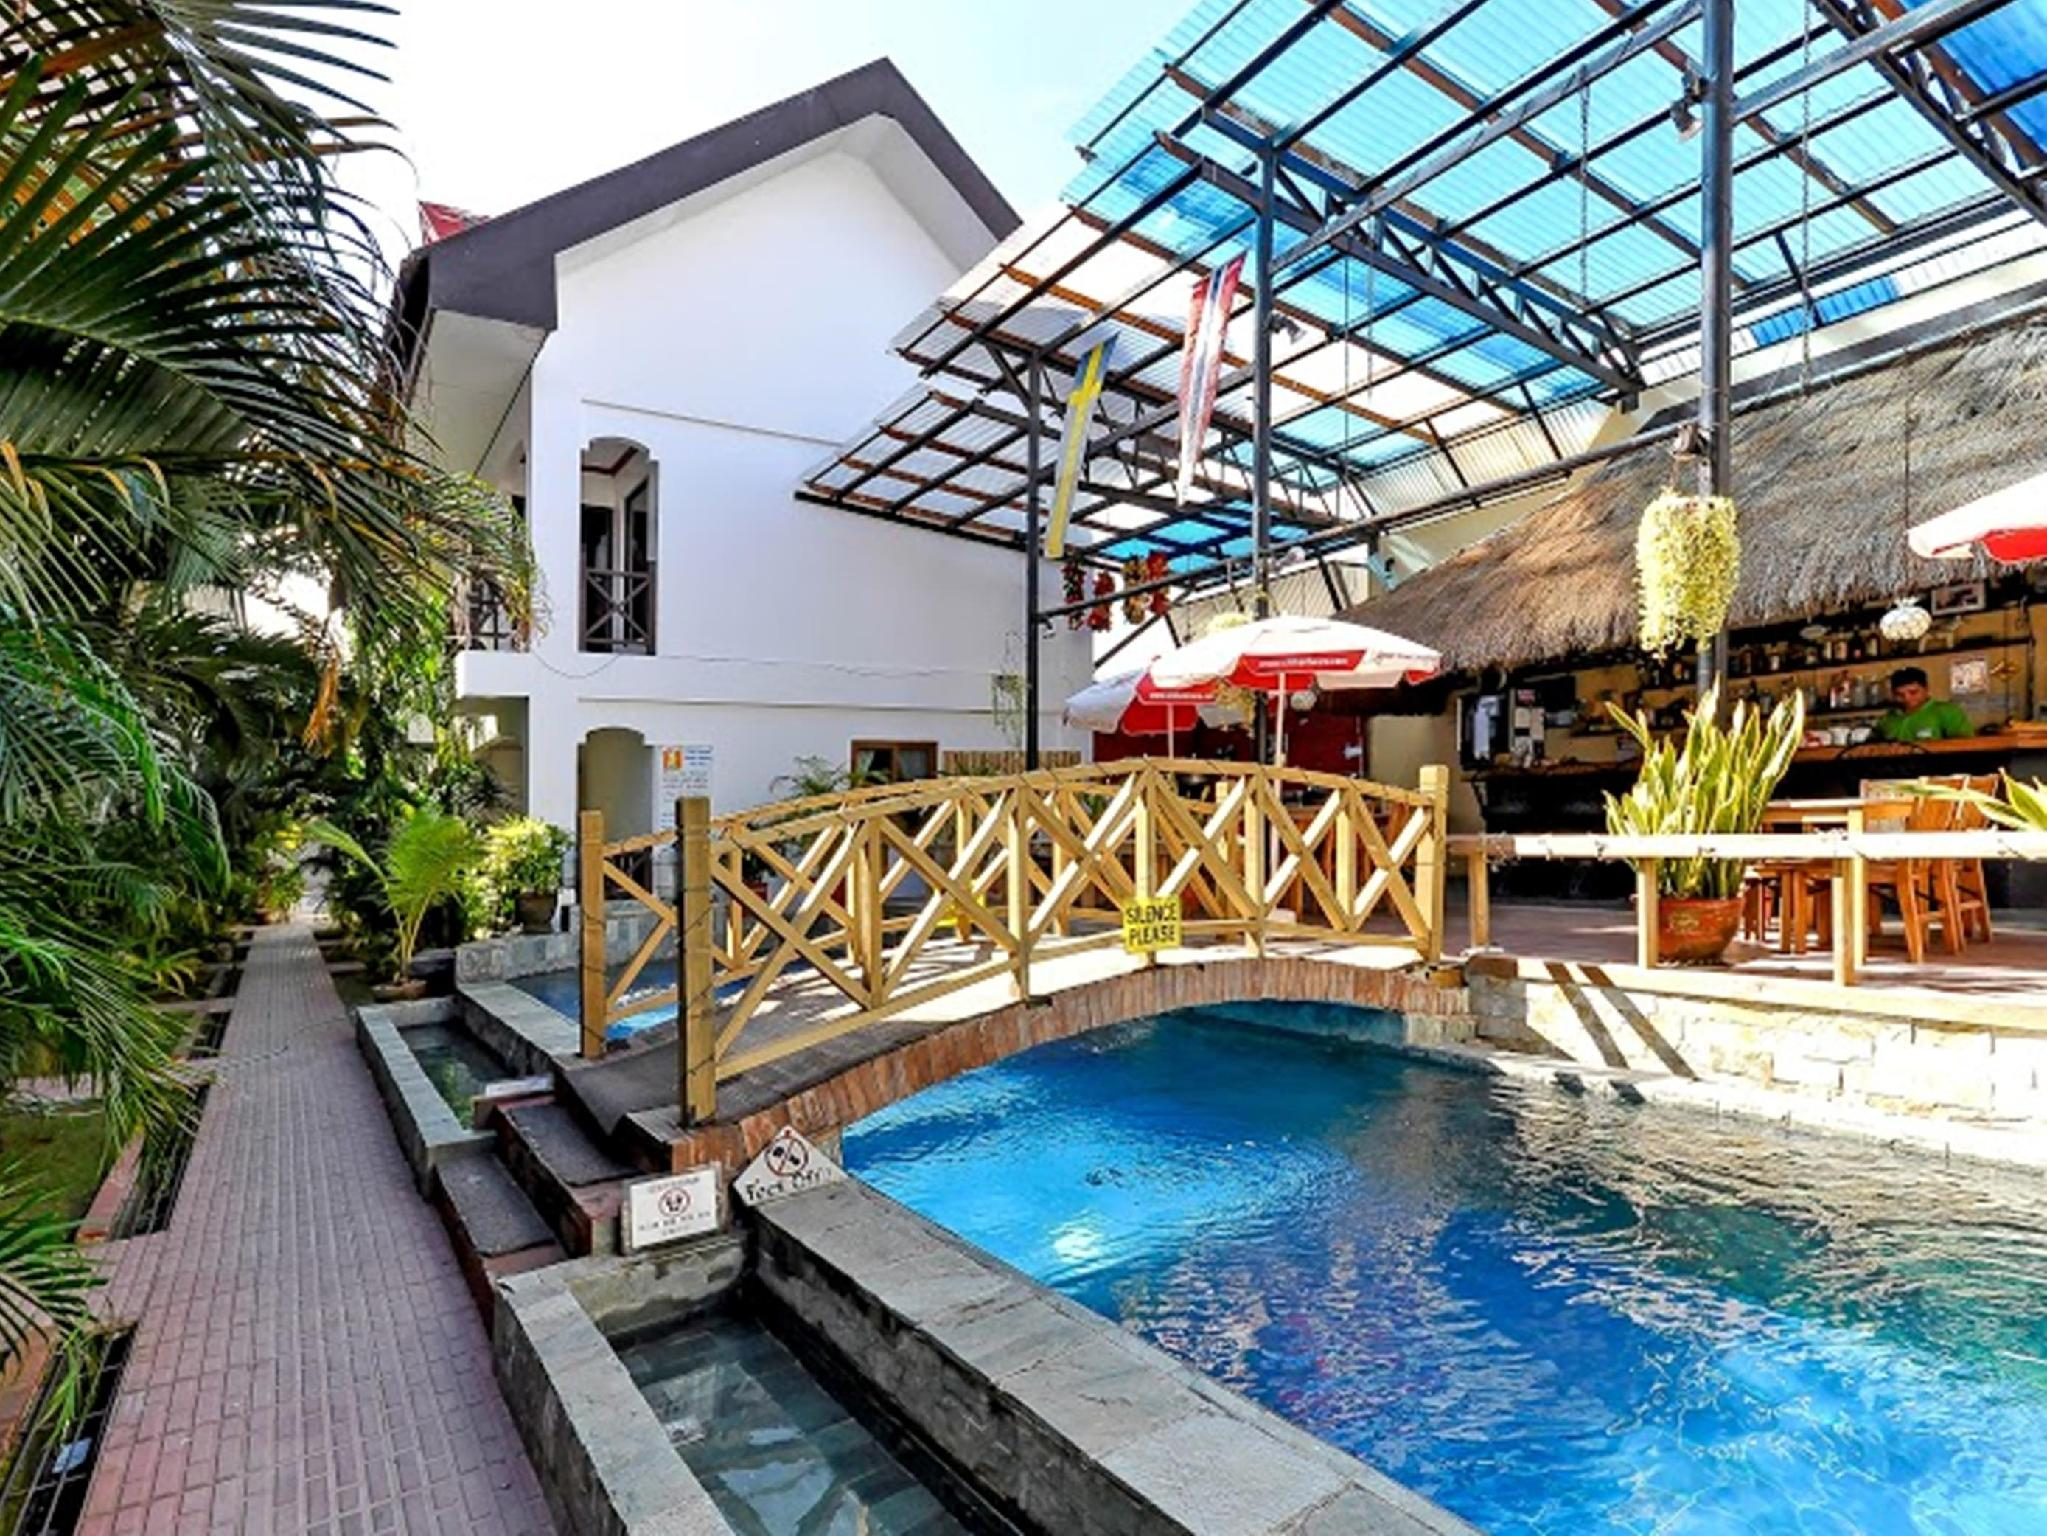 Boracay Hotel ist Girl Friendly. Keine Joiner Fee